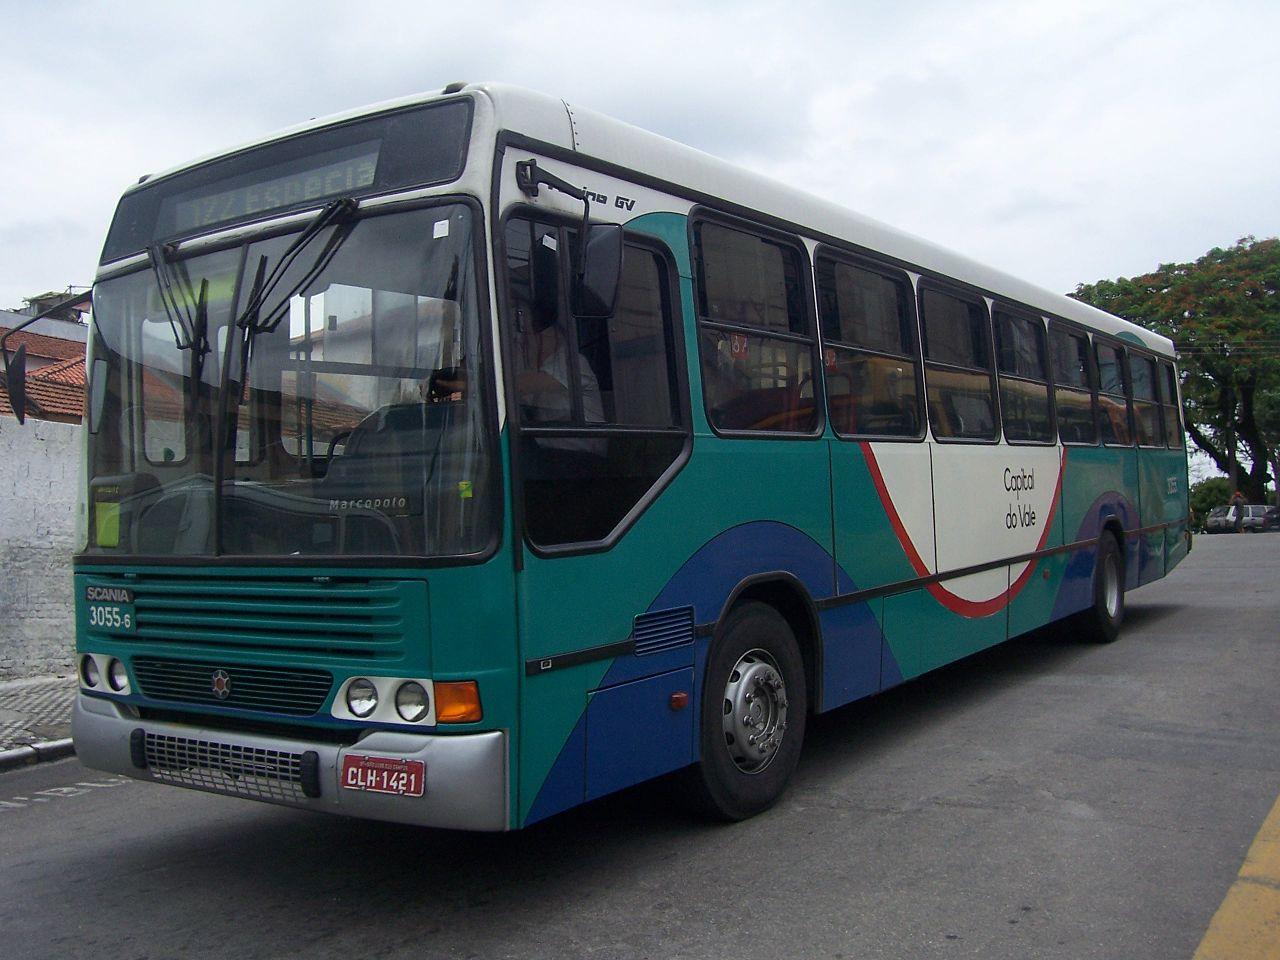 File:Capital do Vale 3055 - Marcopolo Torino GV - Scania F-94.JPG ...